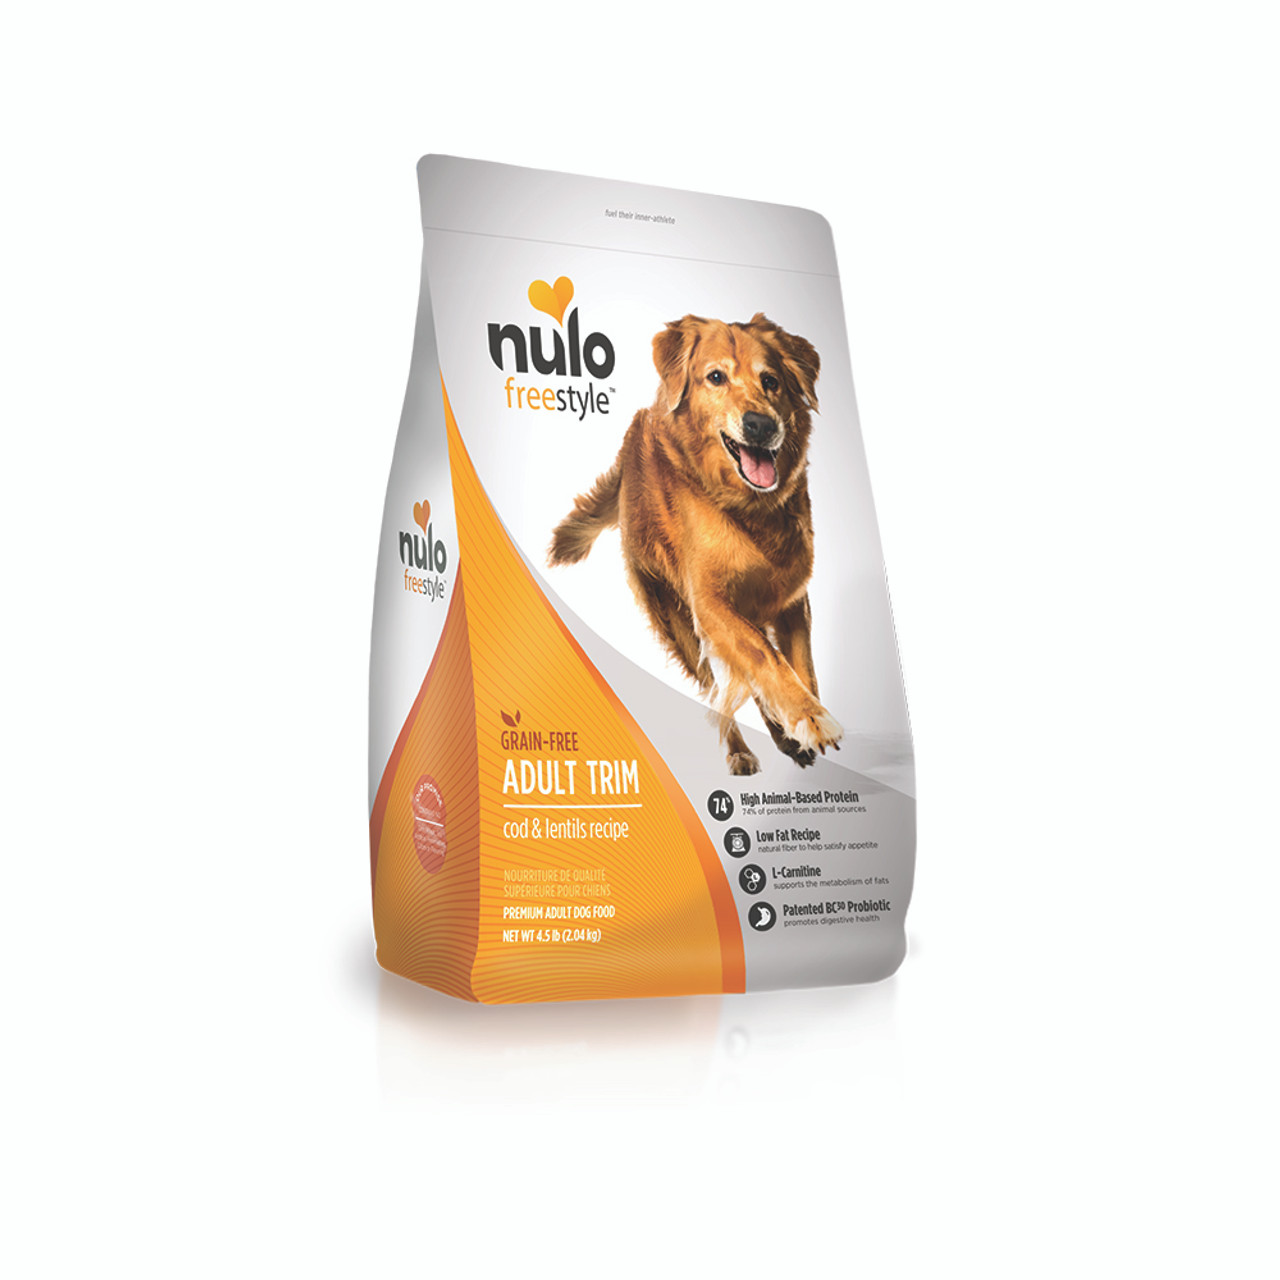 Nulo Freestyle Adult Trim Cod & Lentils Dry Dog Food